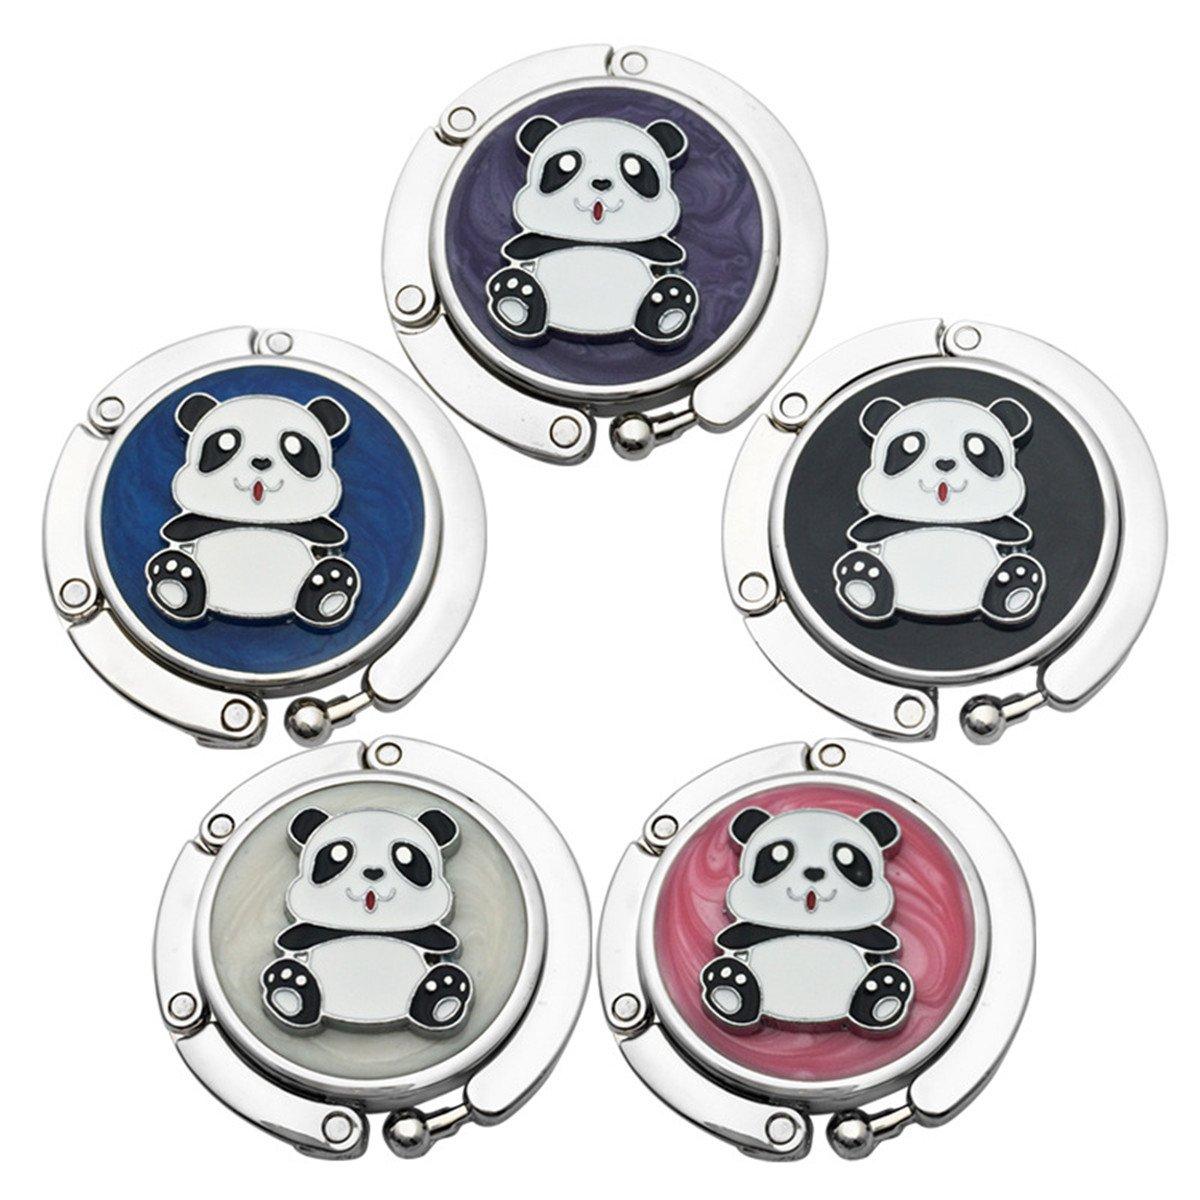 Reizteko Purse Hook,Cute Panda Foldable Handbag Purse Hanger Hook Holder for Tables (Pack of 5)